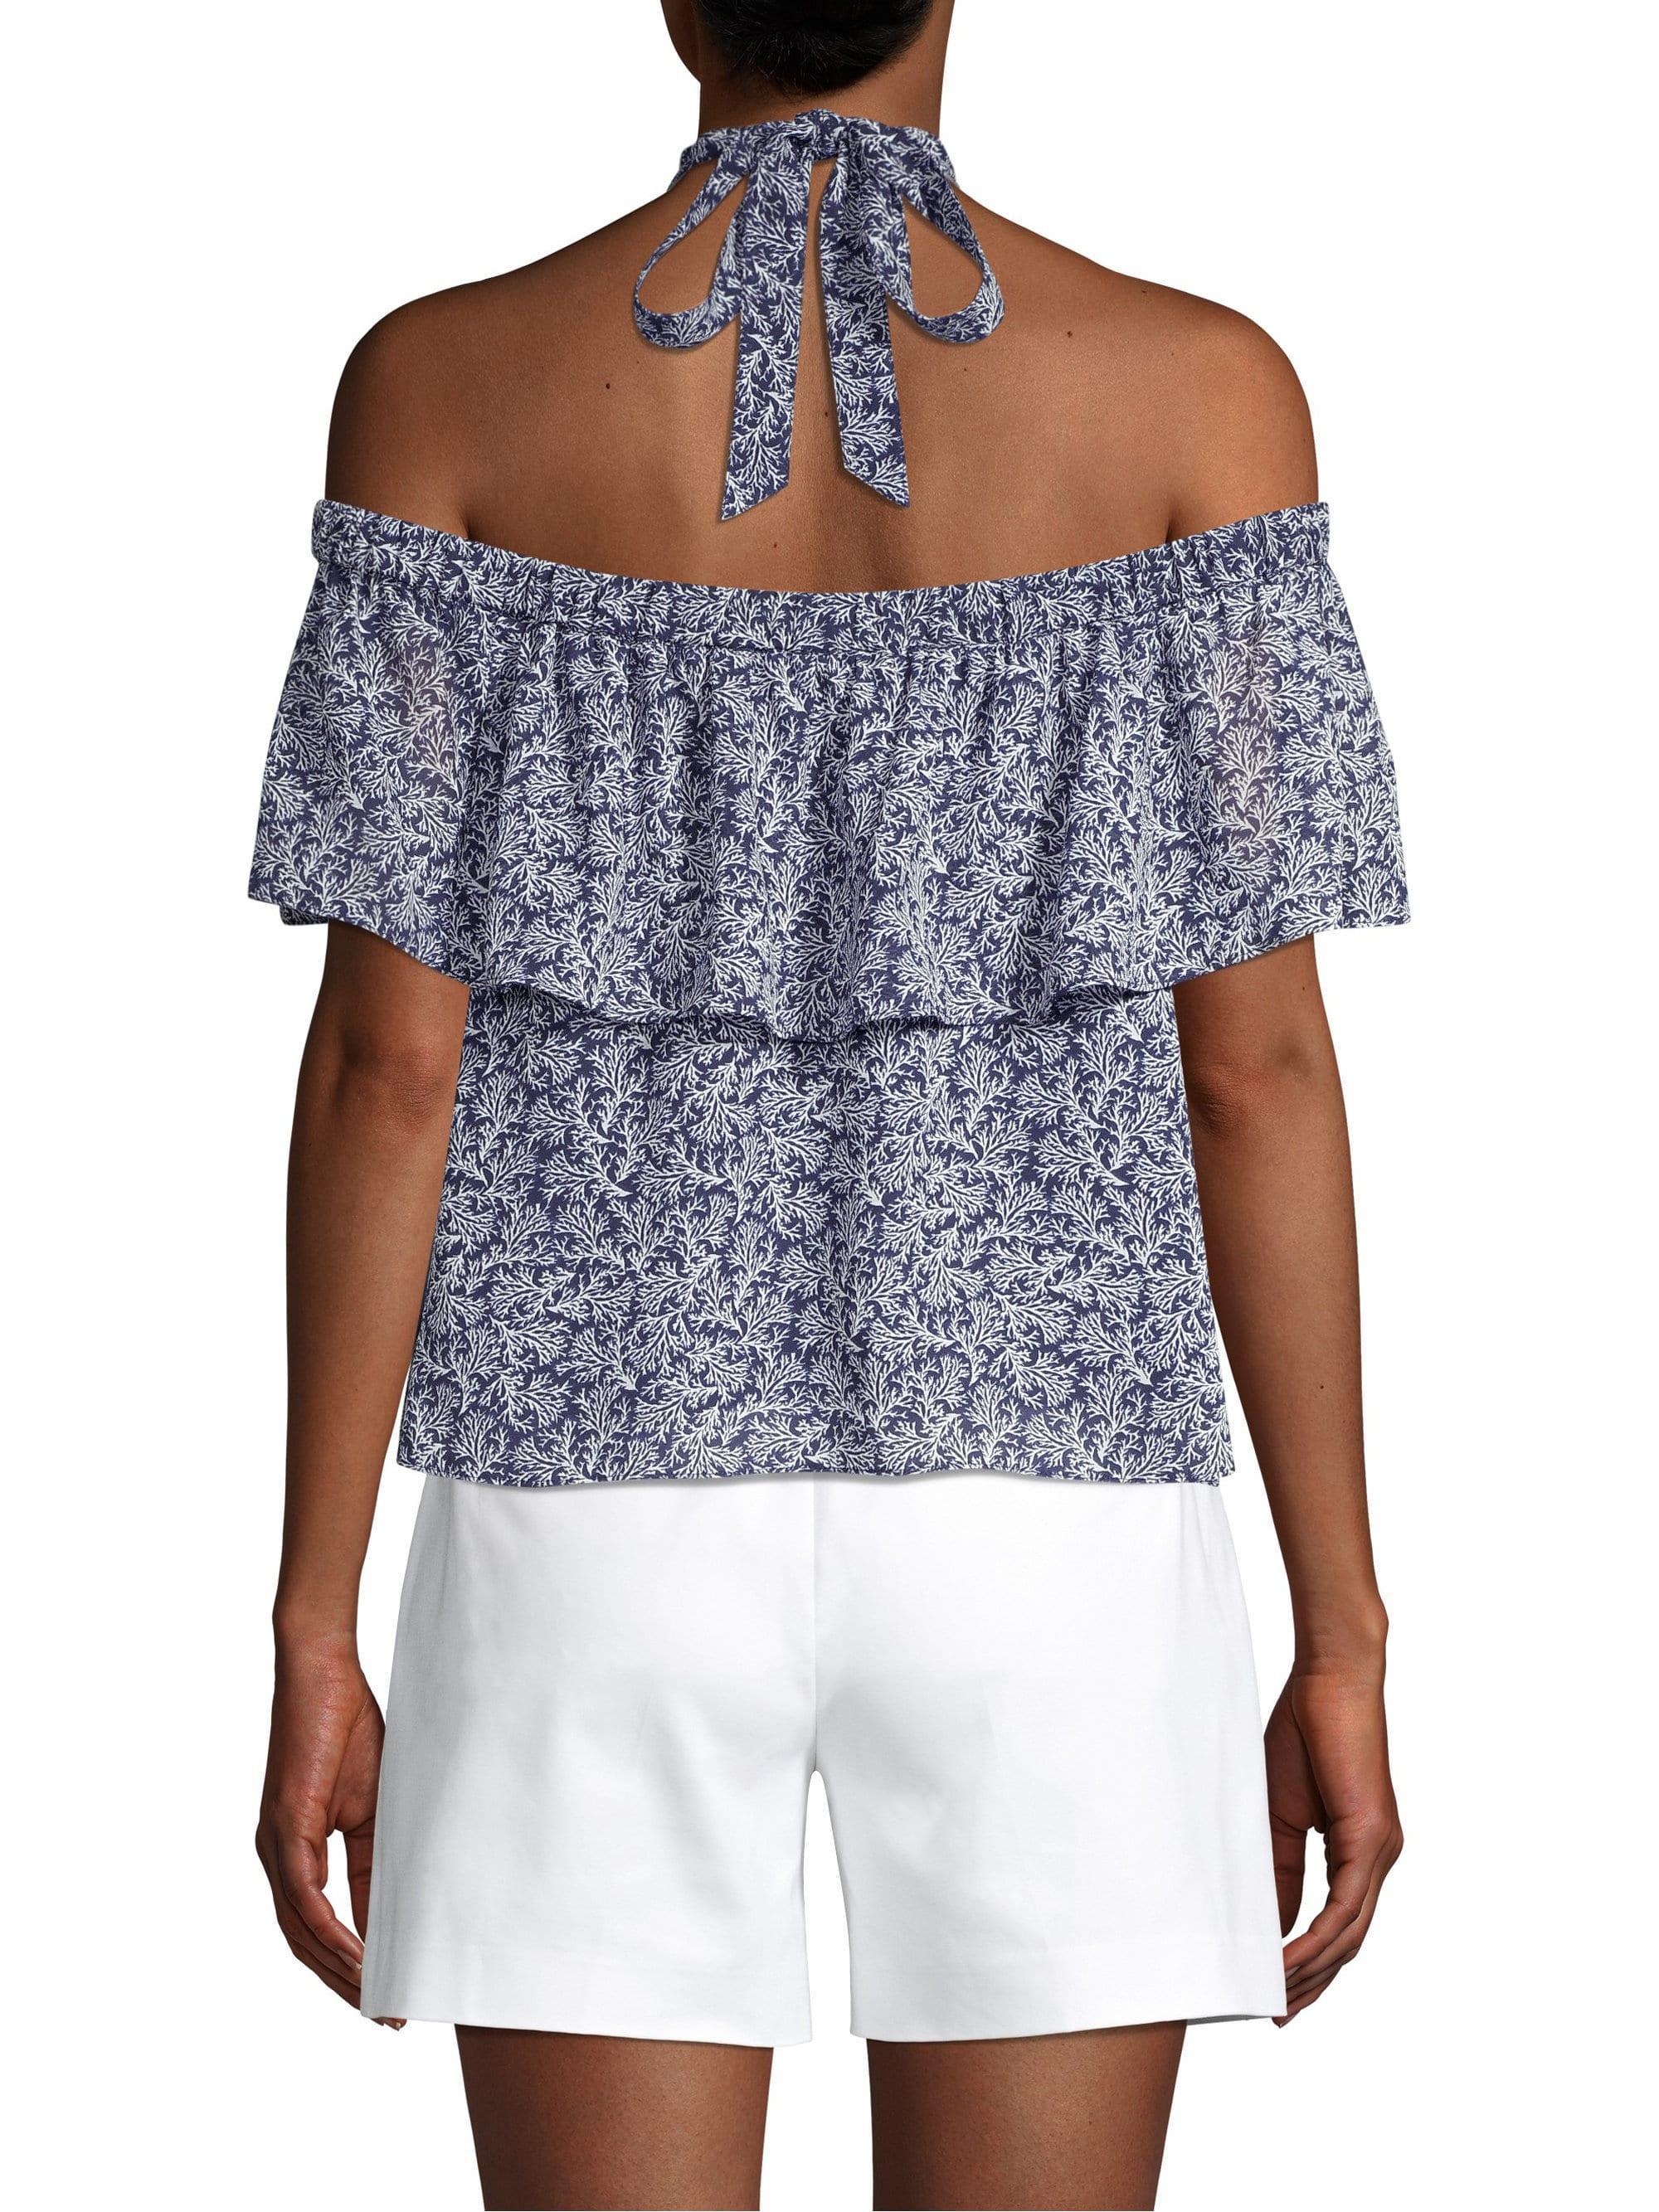 6537266fd82 MICHAEL Michael Kors - Blue Women's Printed Off-the-shoulder Halter-neck Top.  View fullscreen